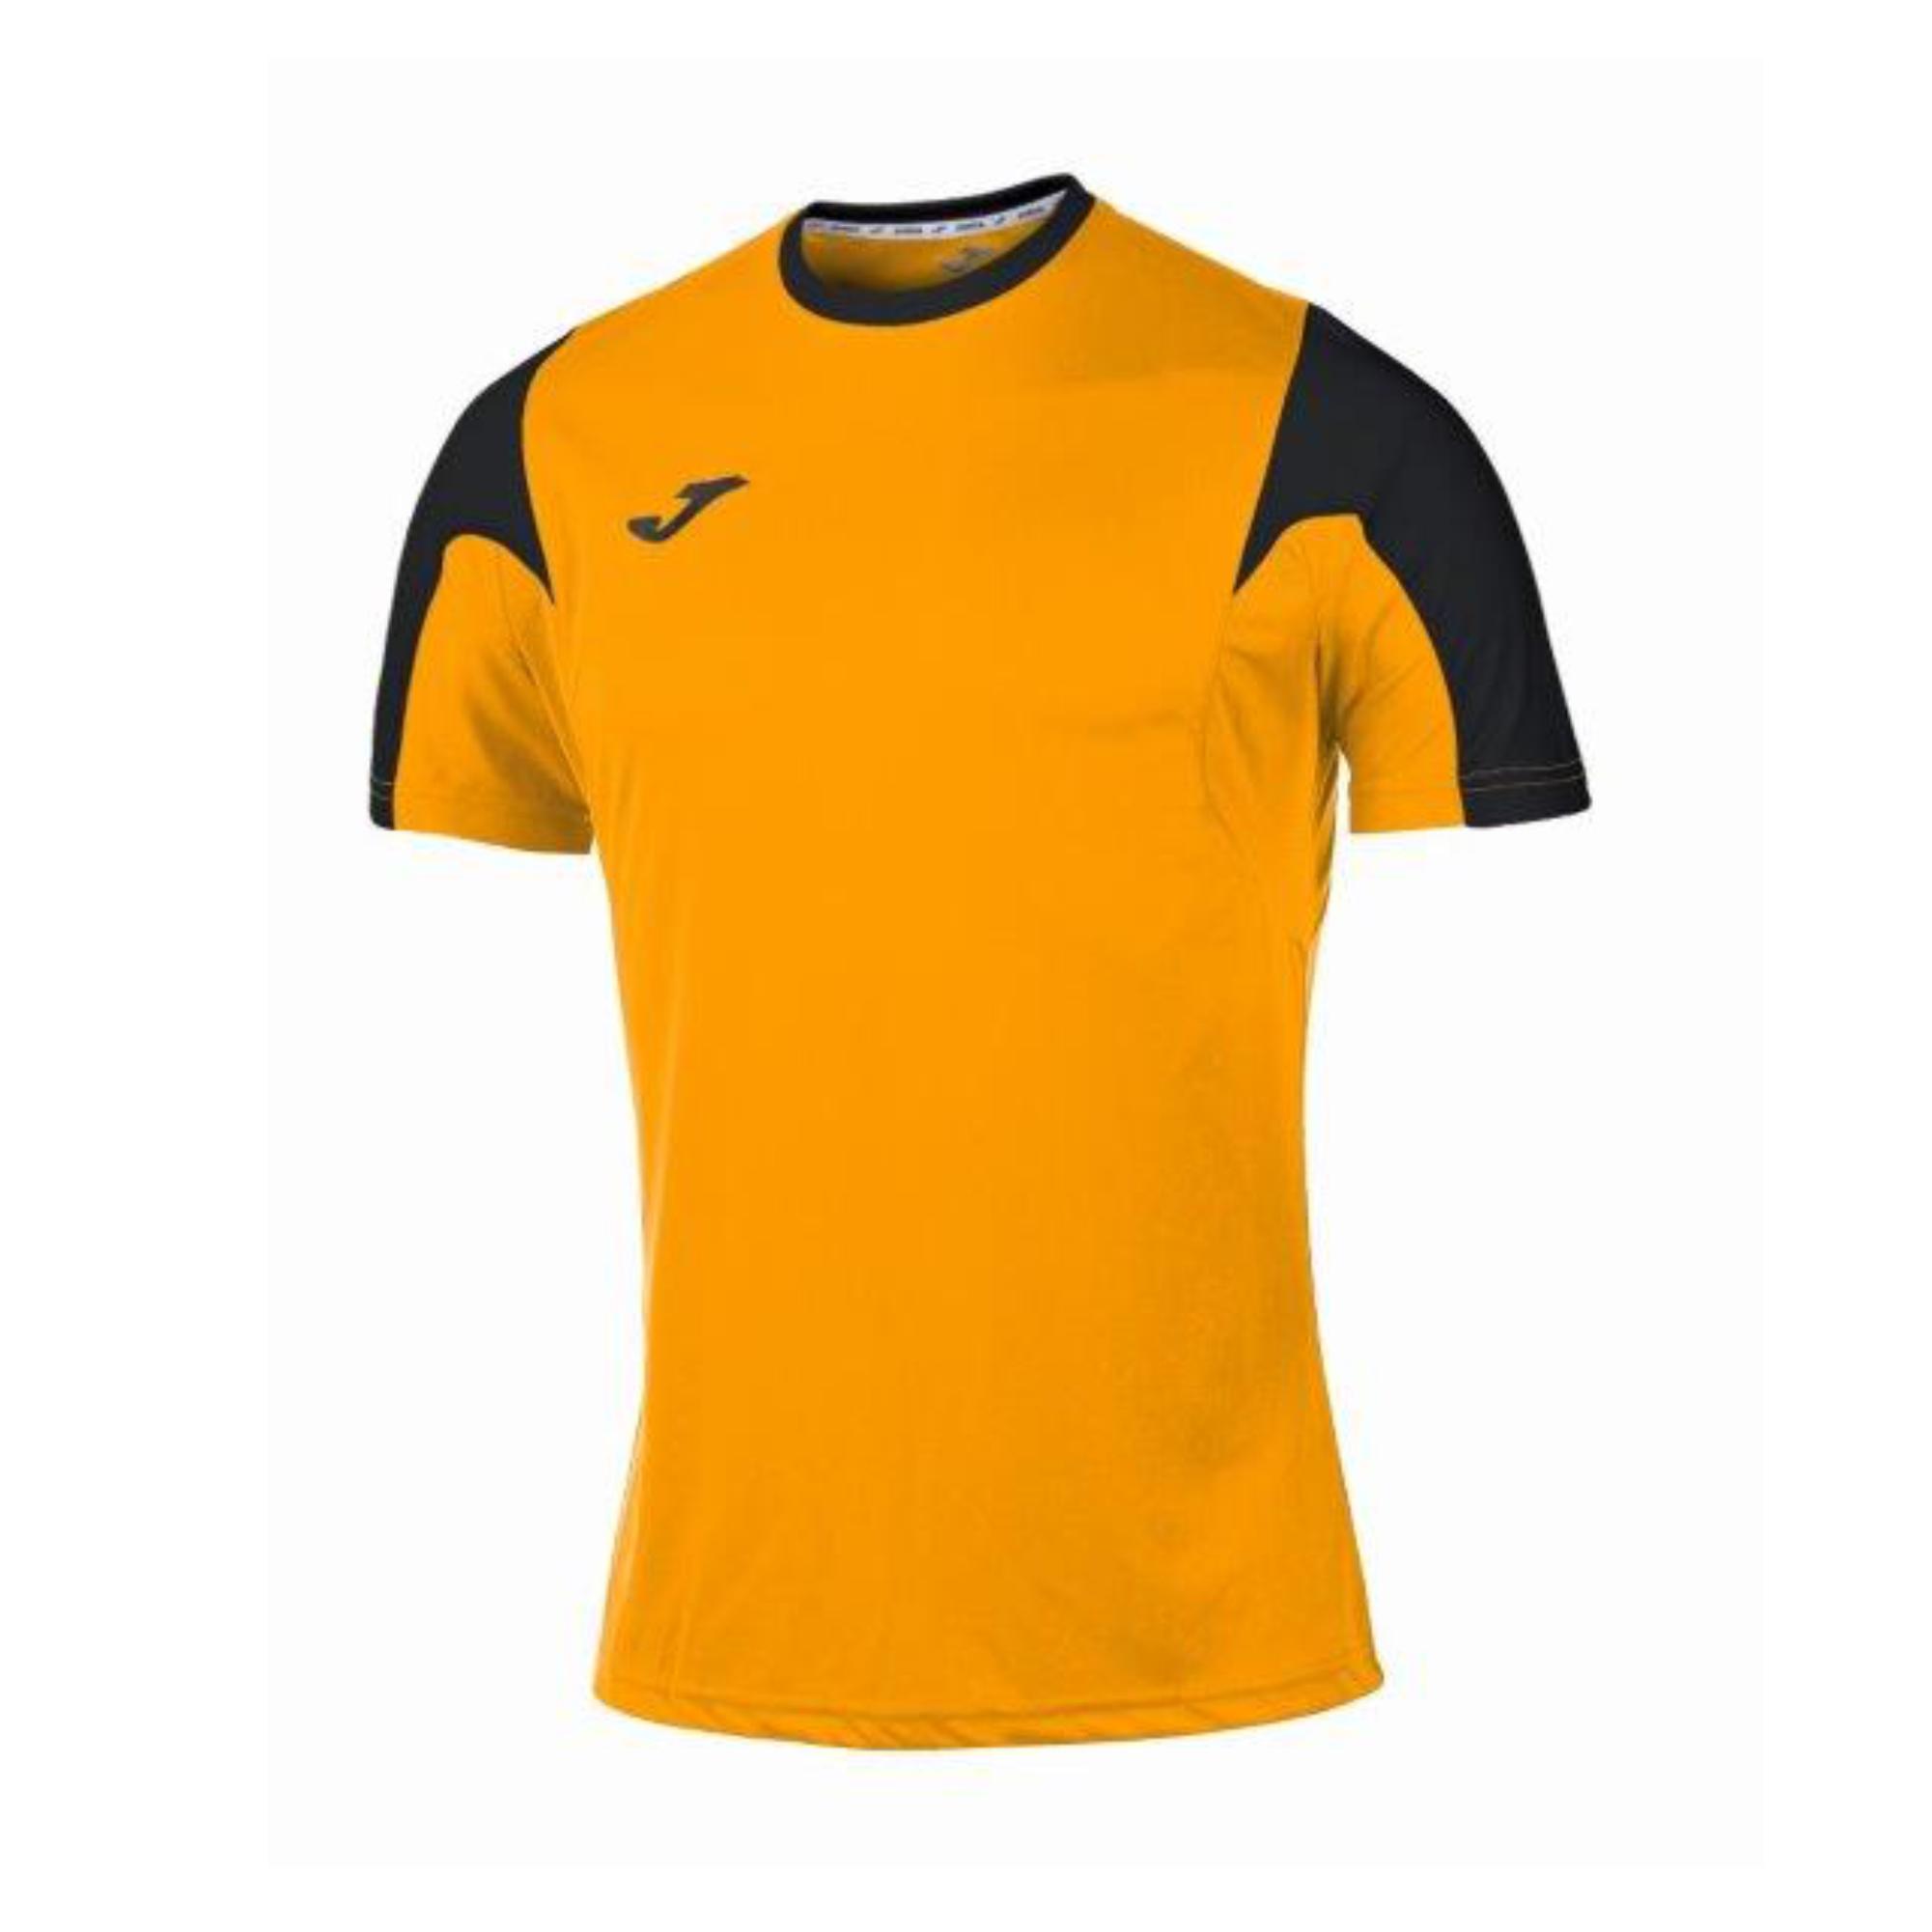 7590d1c5602 Estadio Jersey Short Sleeve - JFC Sports